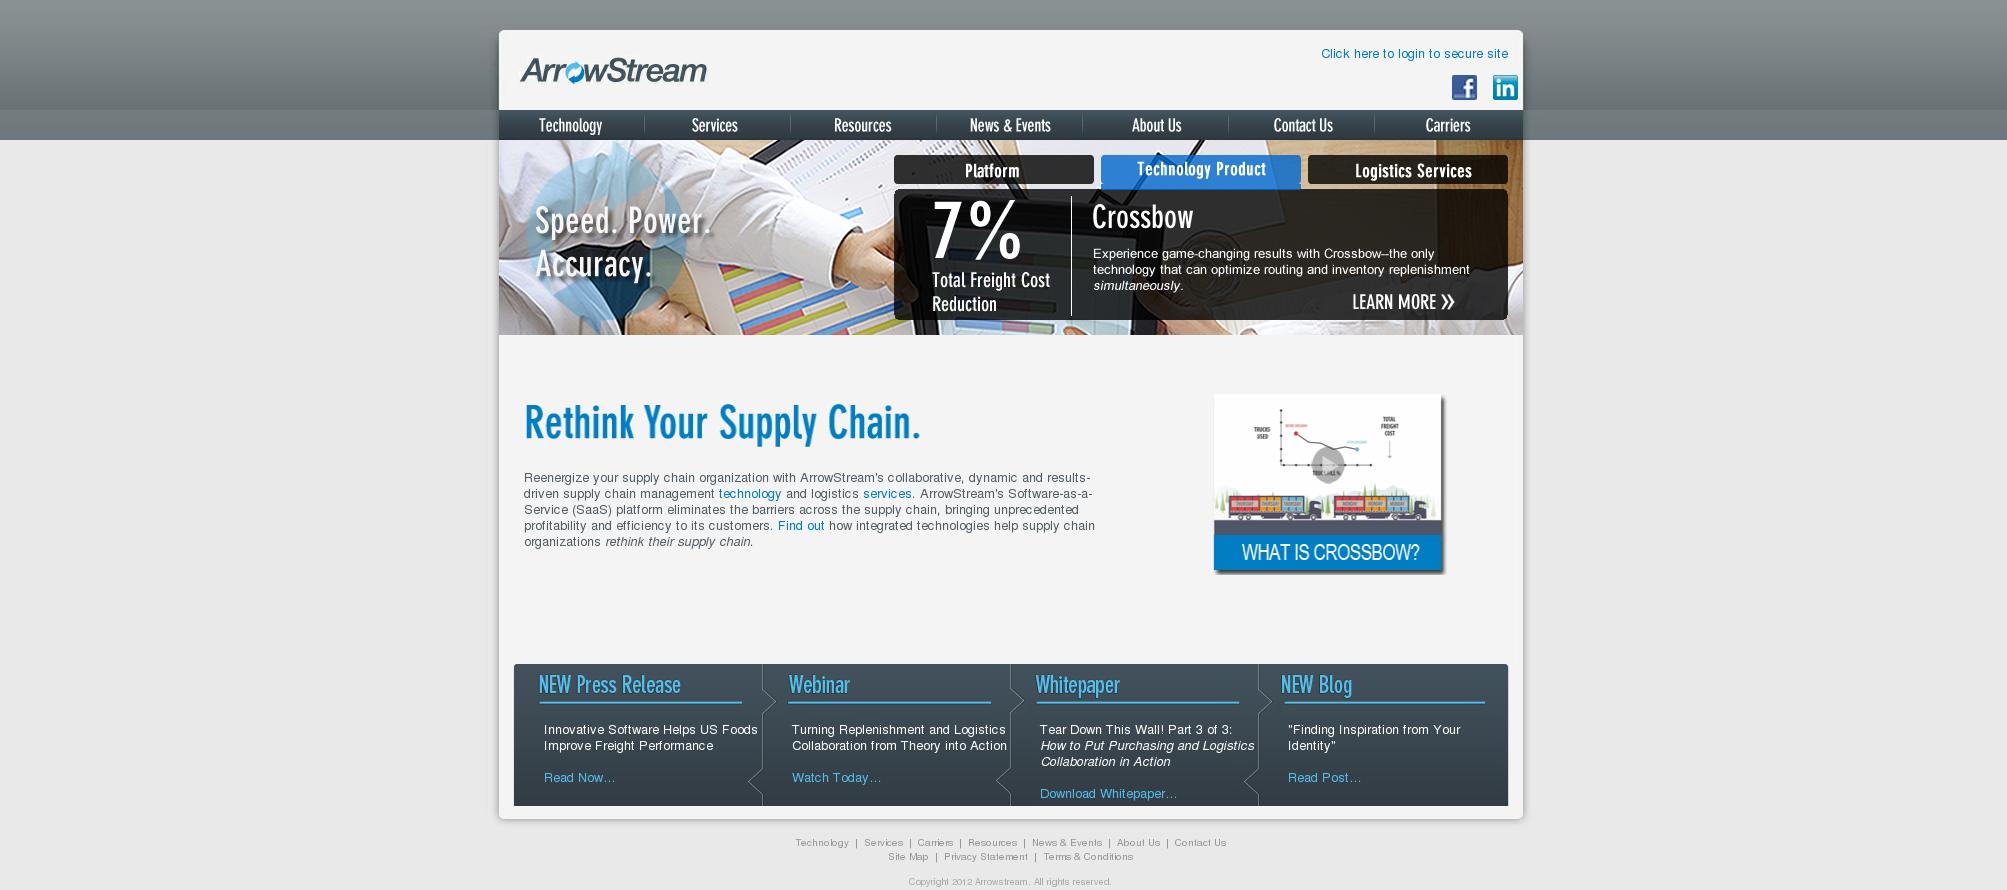 Arrowstream online dating